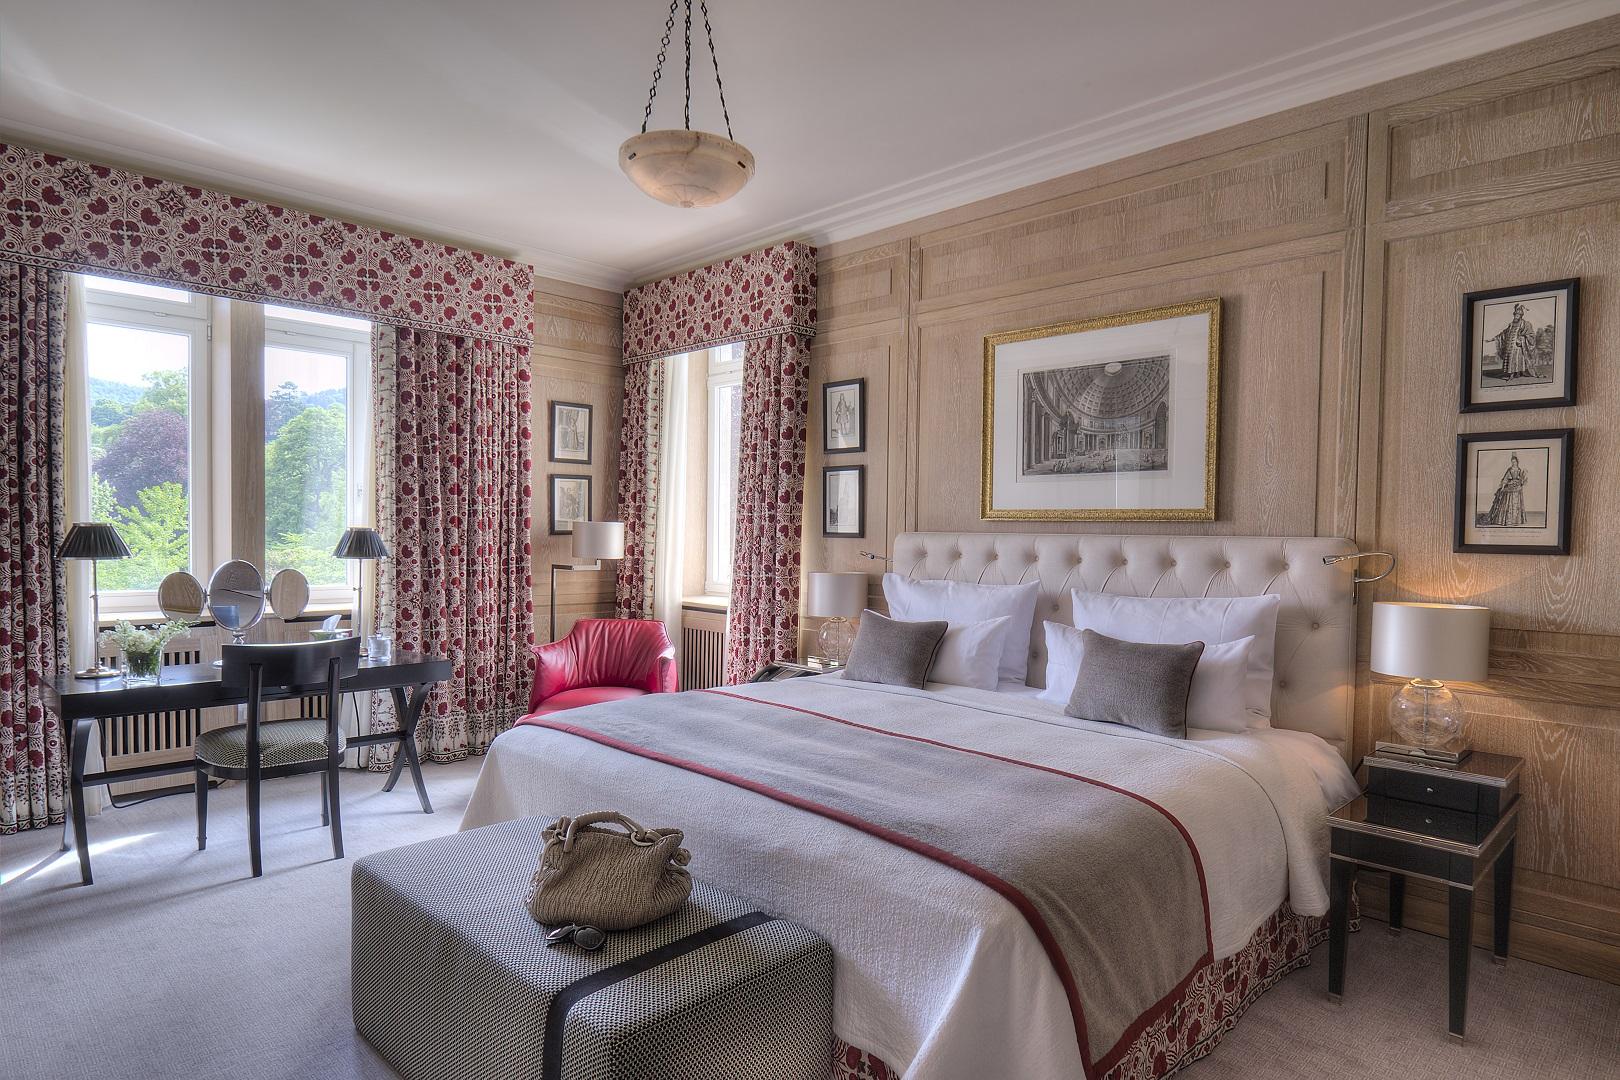 Brenners_Hotel_Villa_Stephanie_Kardorff_Lichtplanung